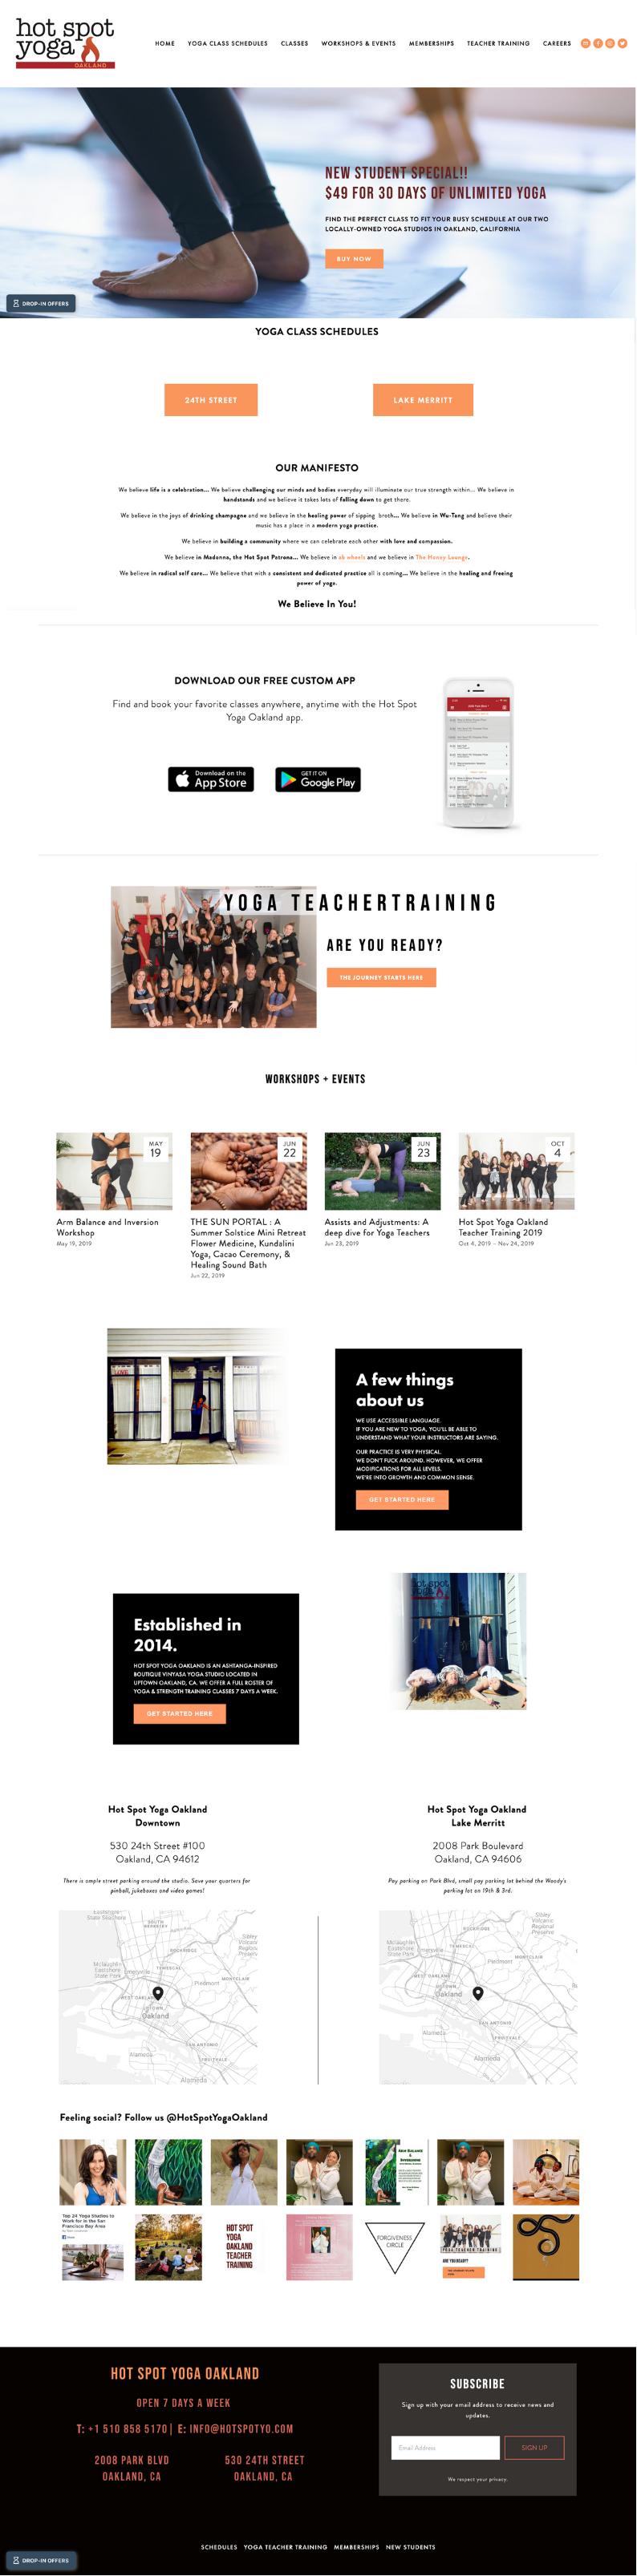 HSYO - Website Refresh May 2019 (1).png